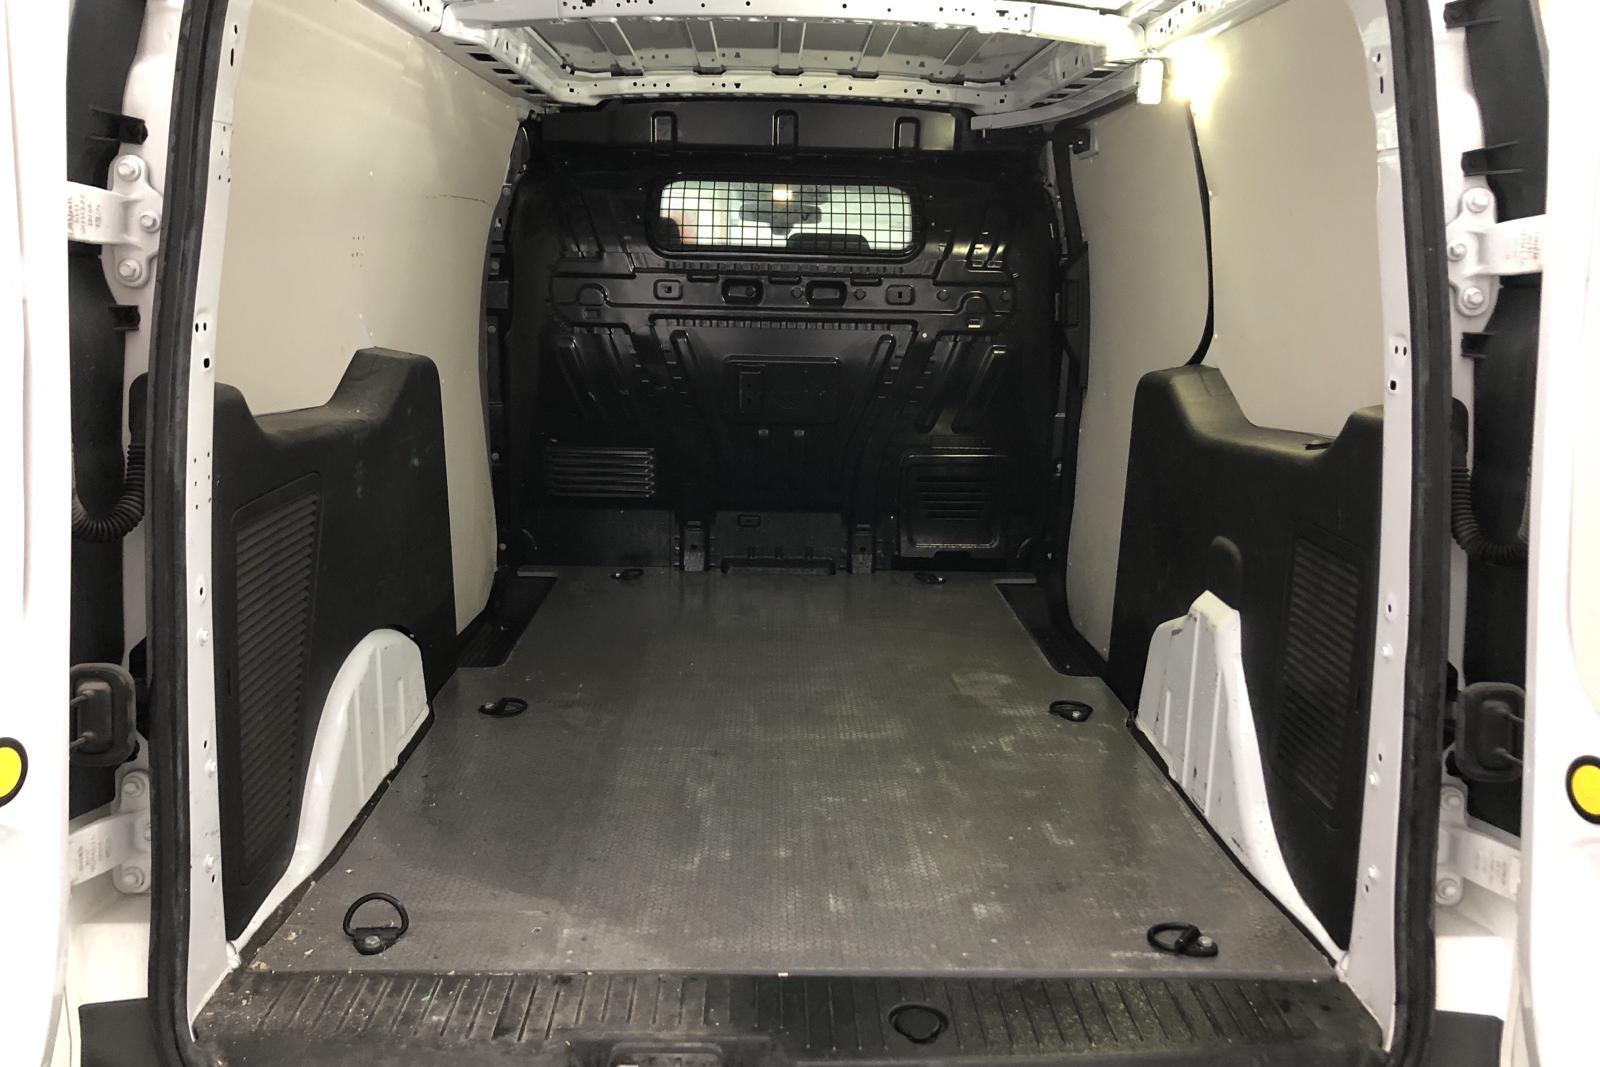 Ford Transit Connect 1.5 TDCi (120hk) - 5 344 mil - Automat - vit - 2016